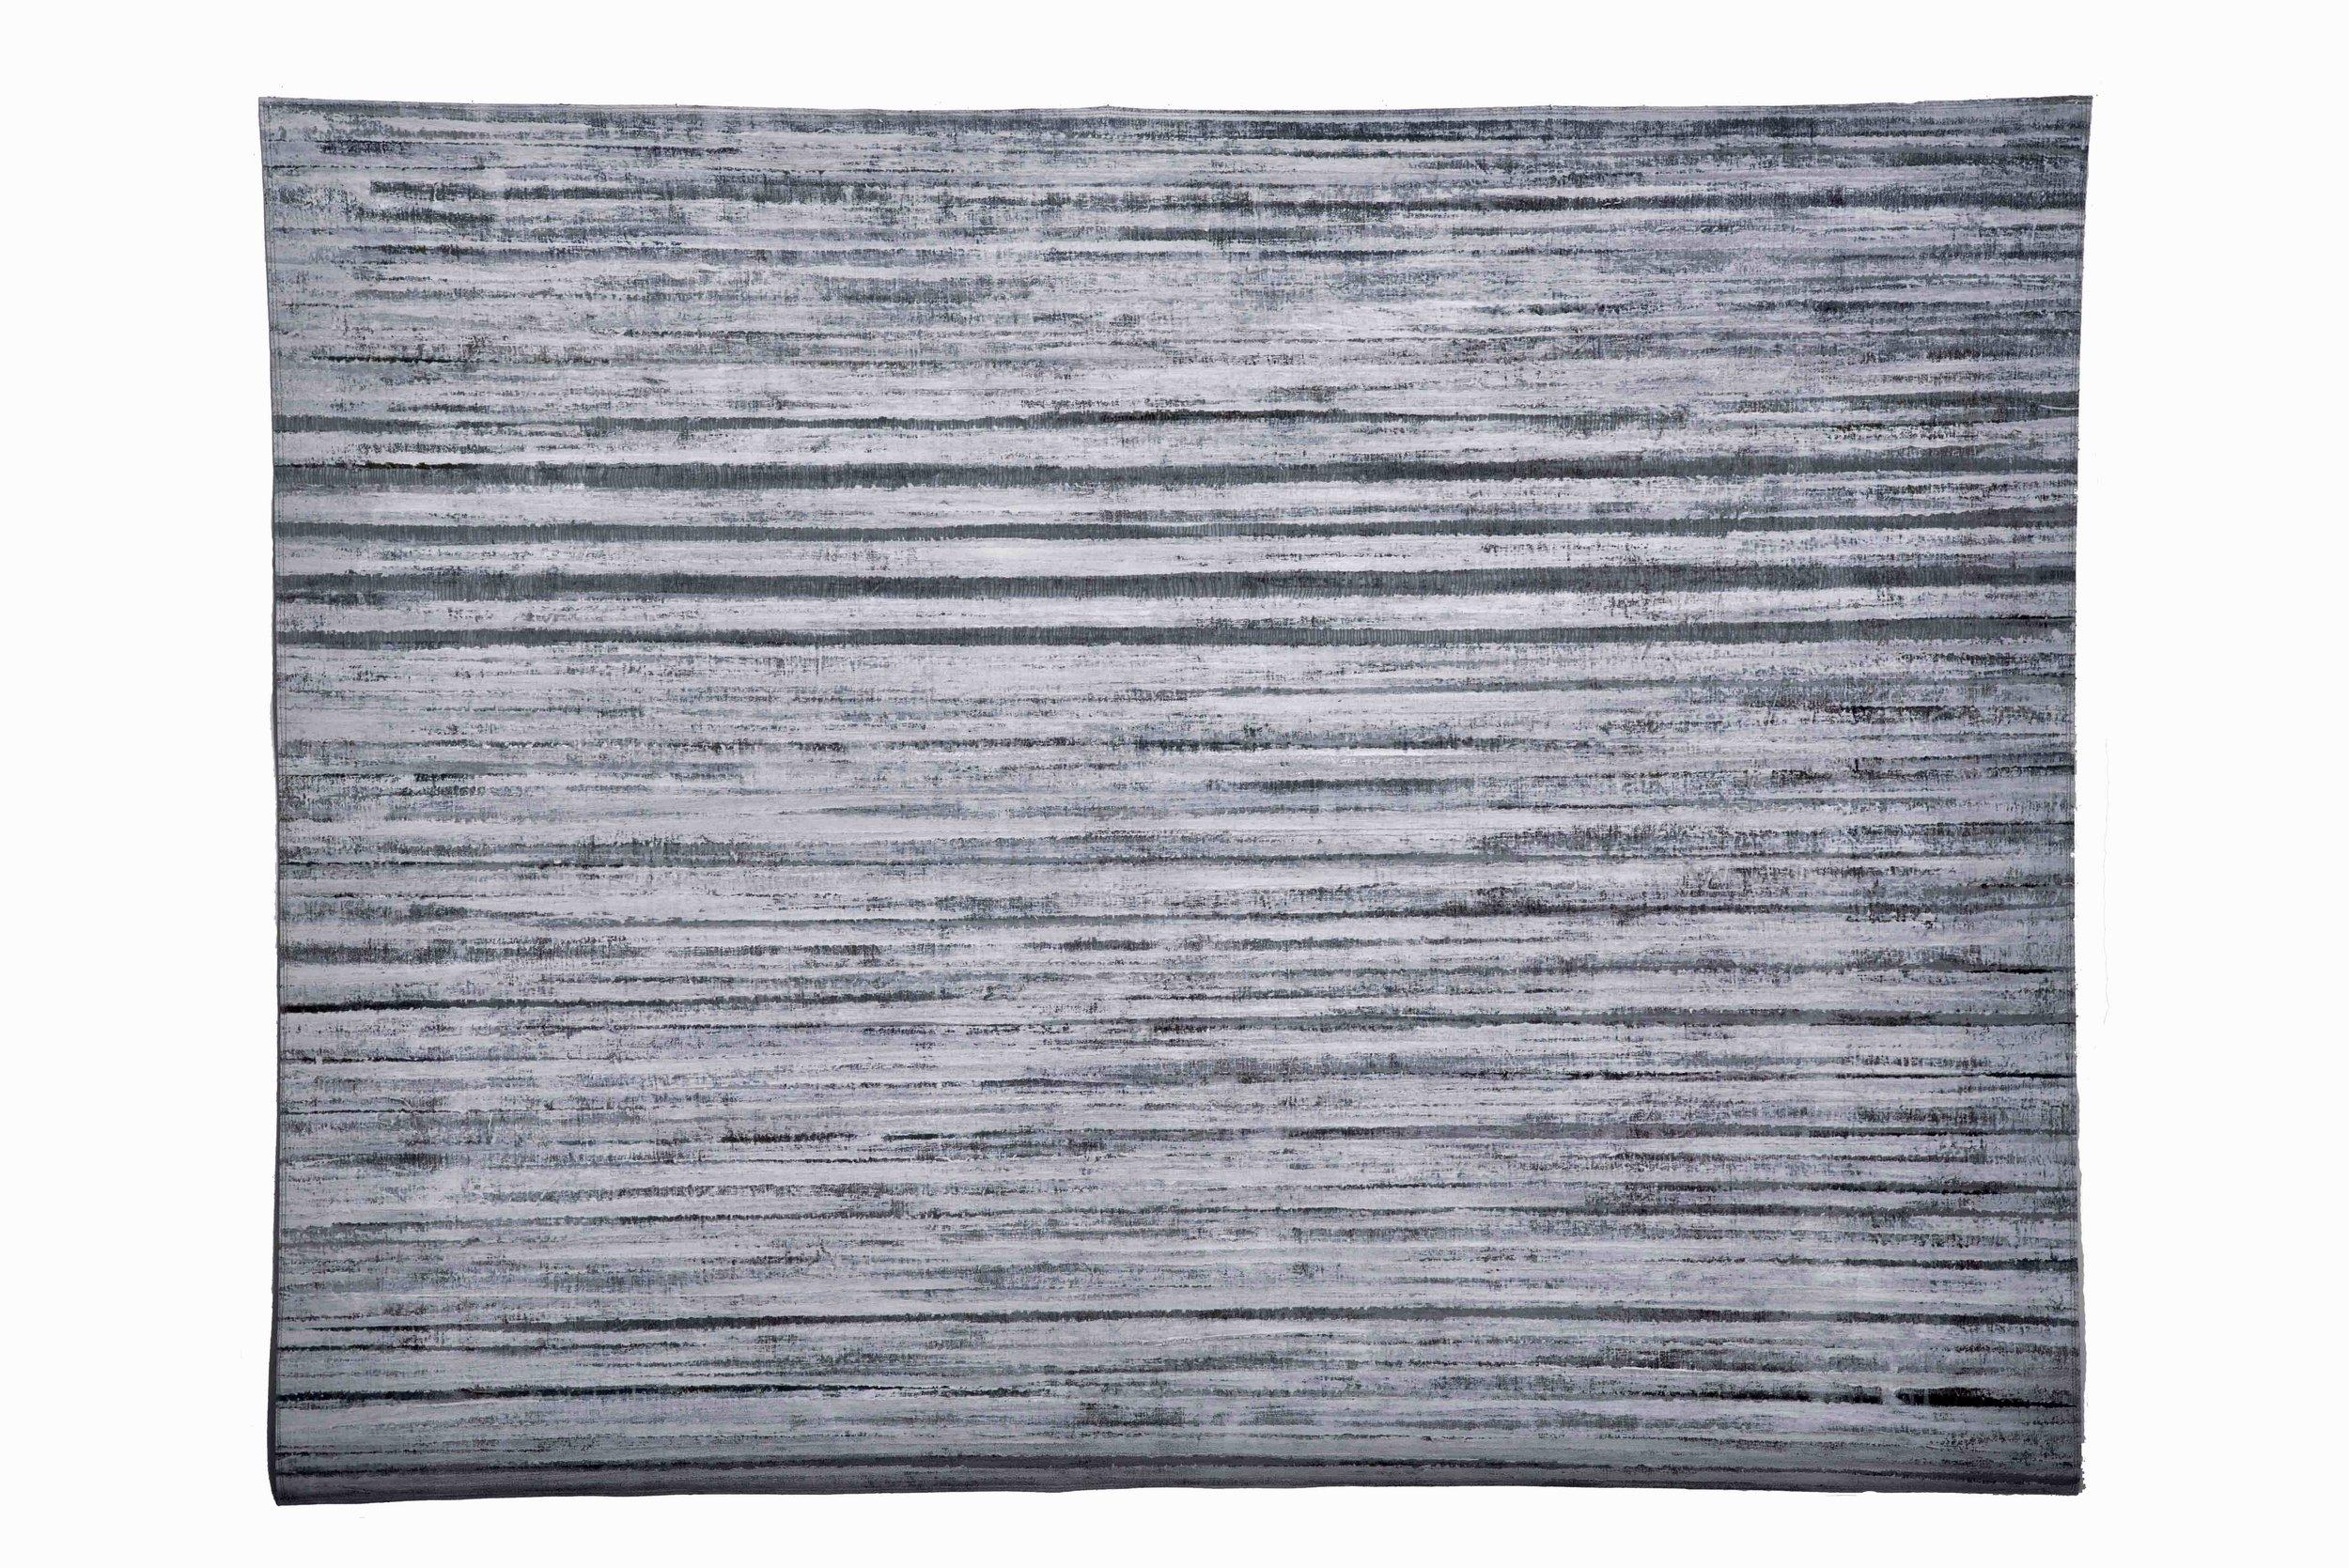 'Arctic', cotton, acrylic paint, machine and hand stitch. 175 x 120cm